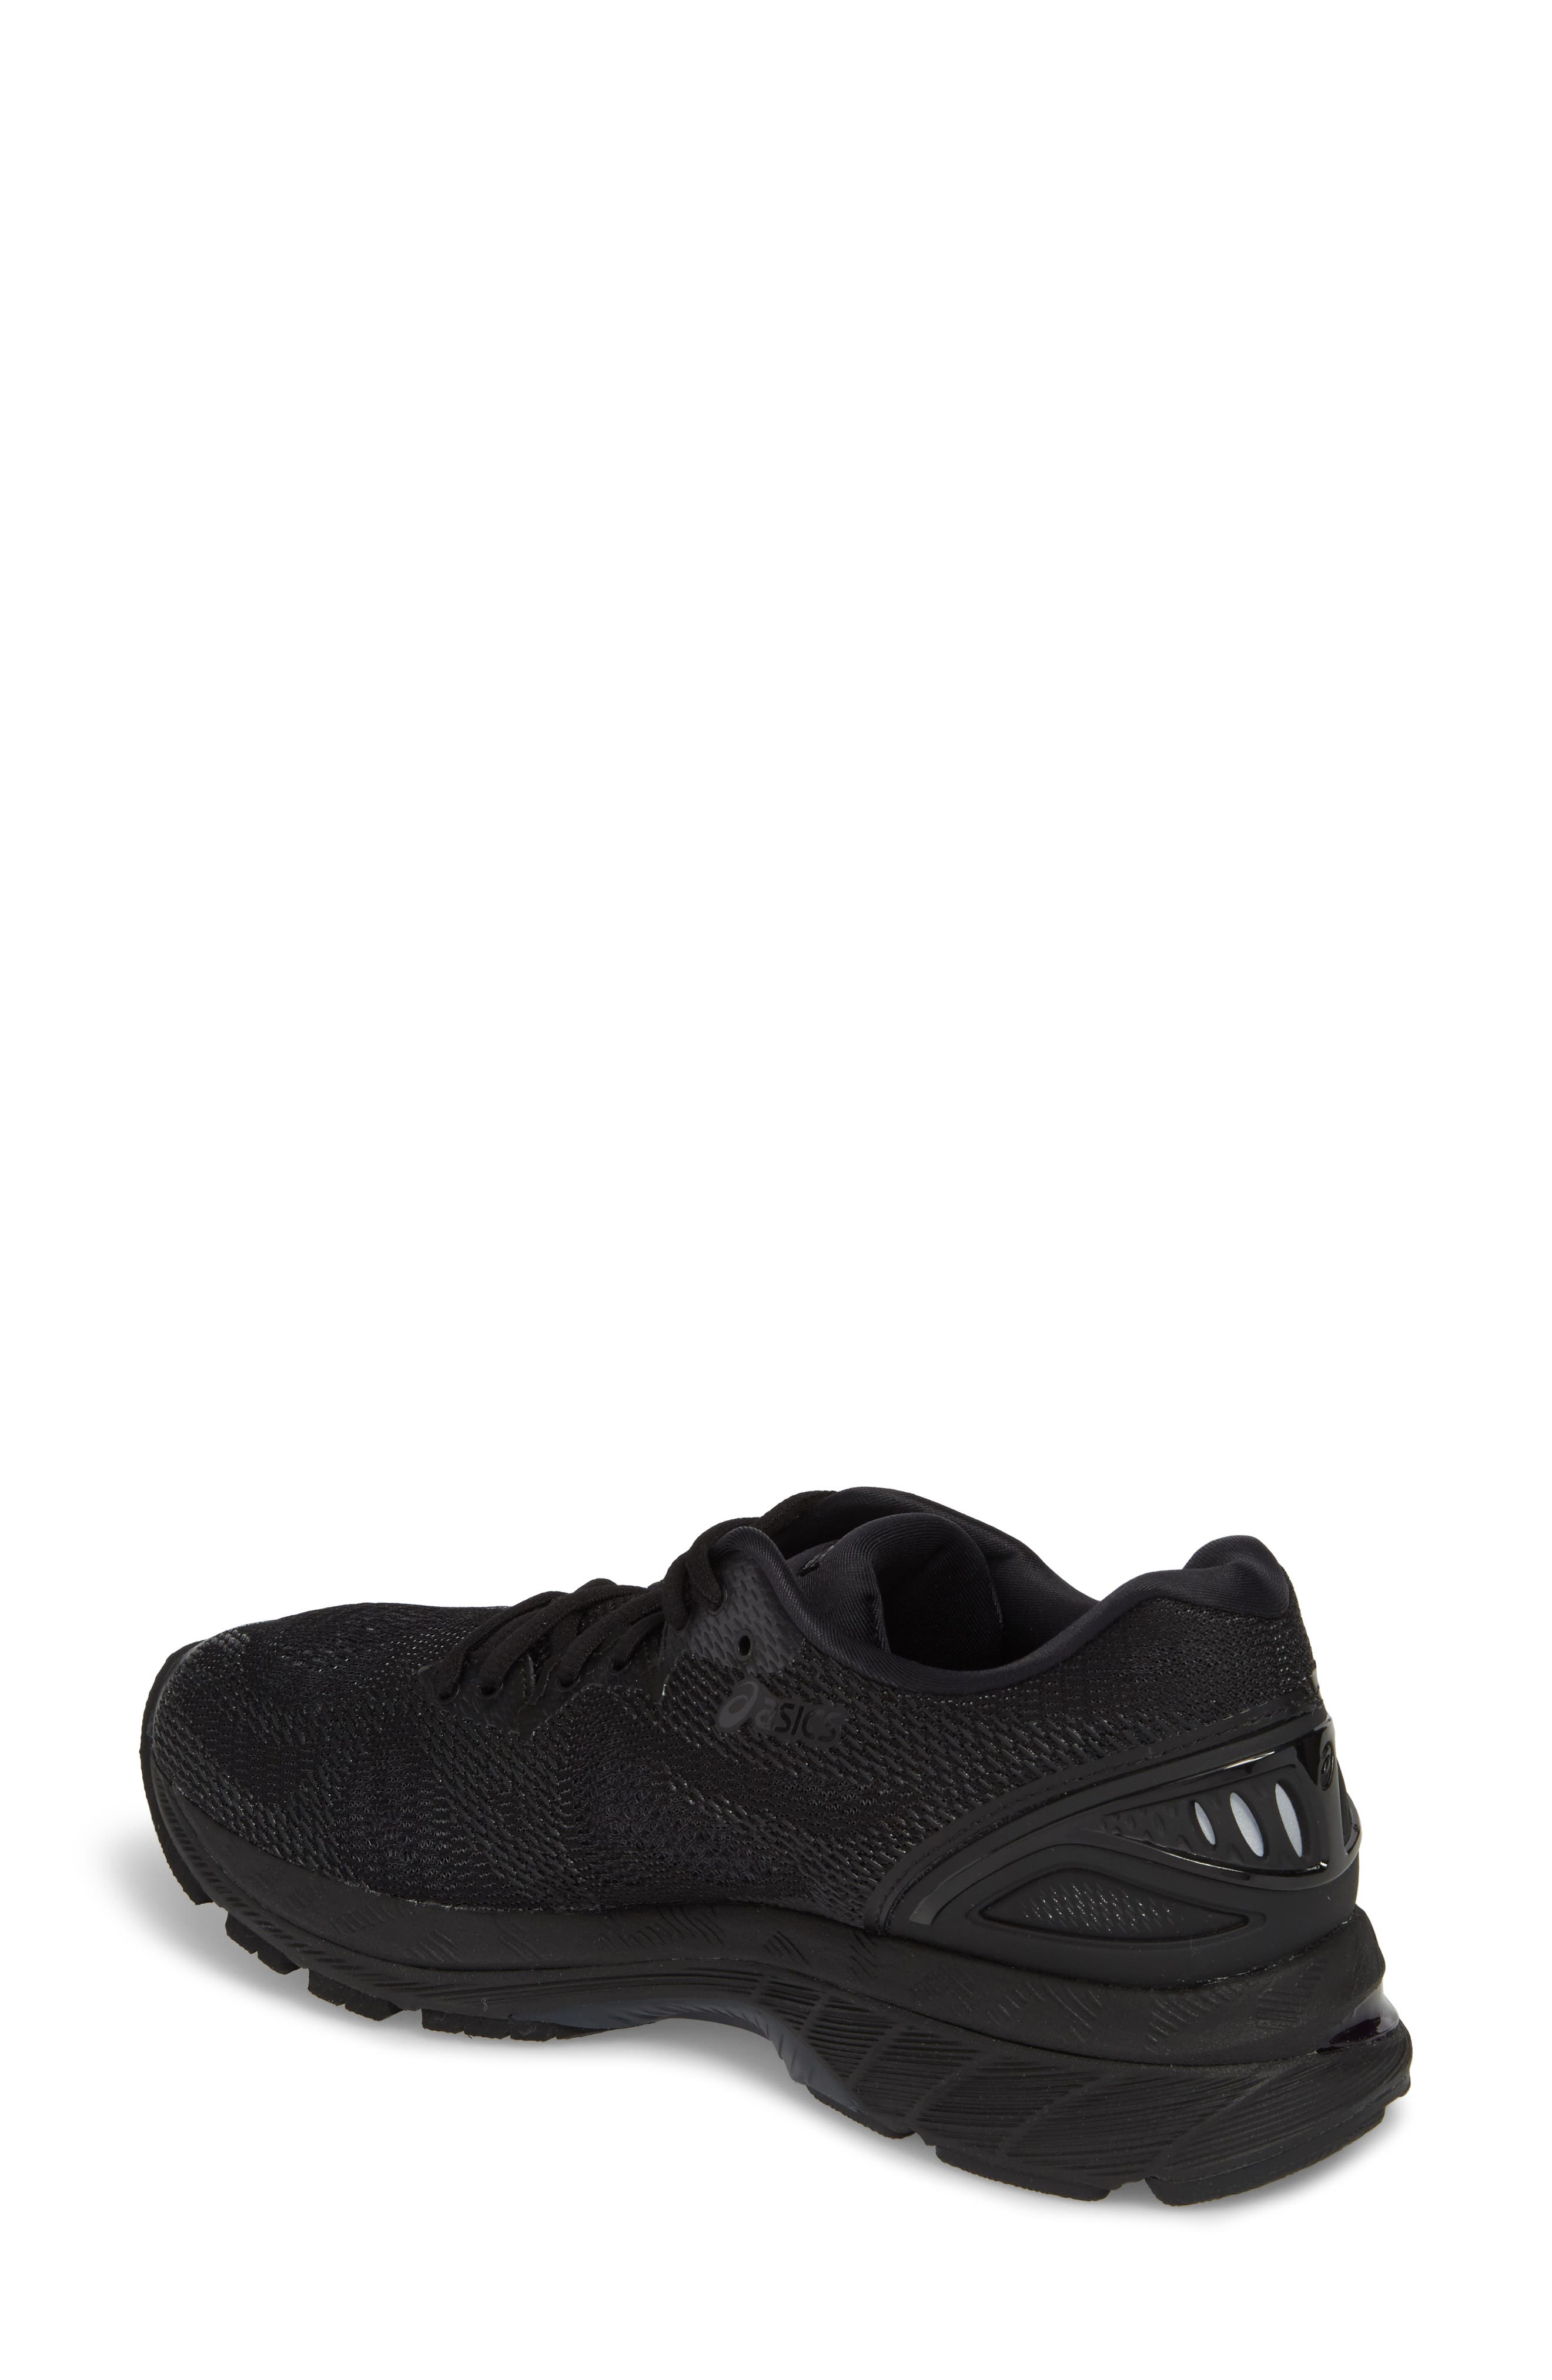 Alternate Image 2  - ASICS® GEL®-Nimbus 20 Running Shoe (Women)